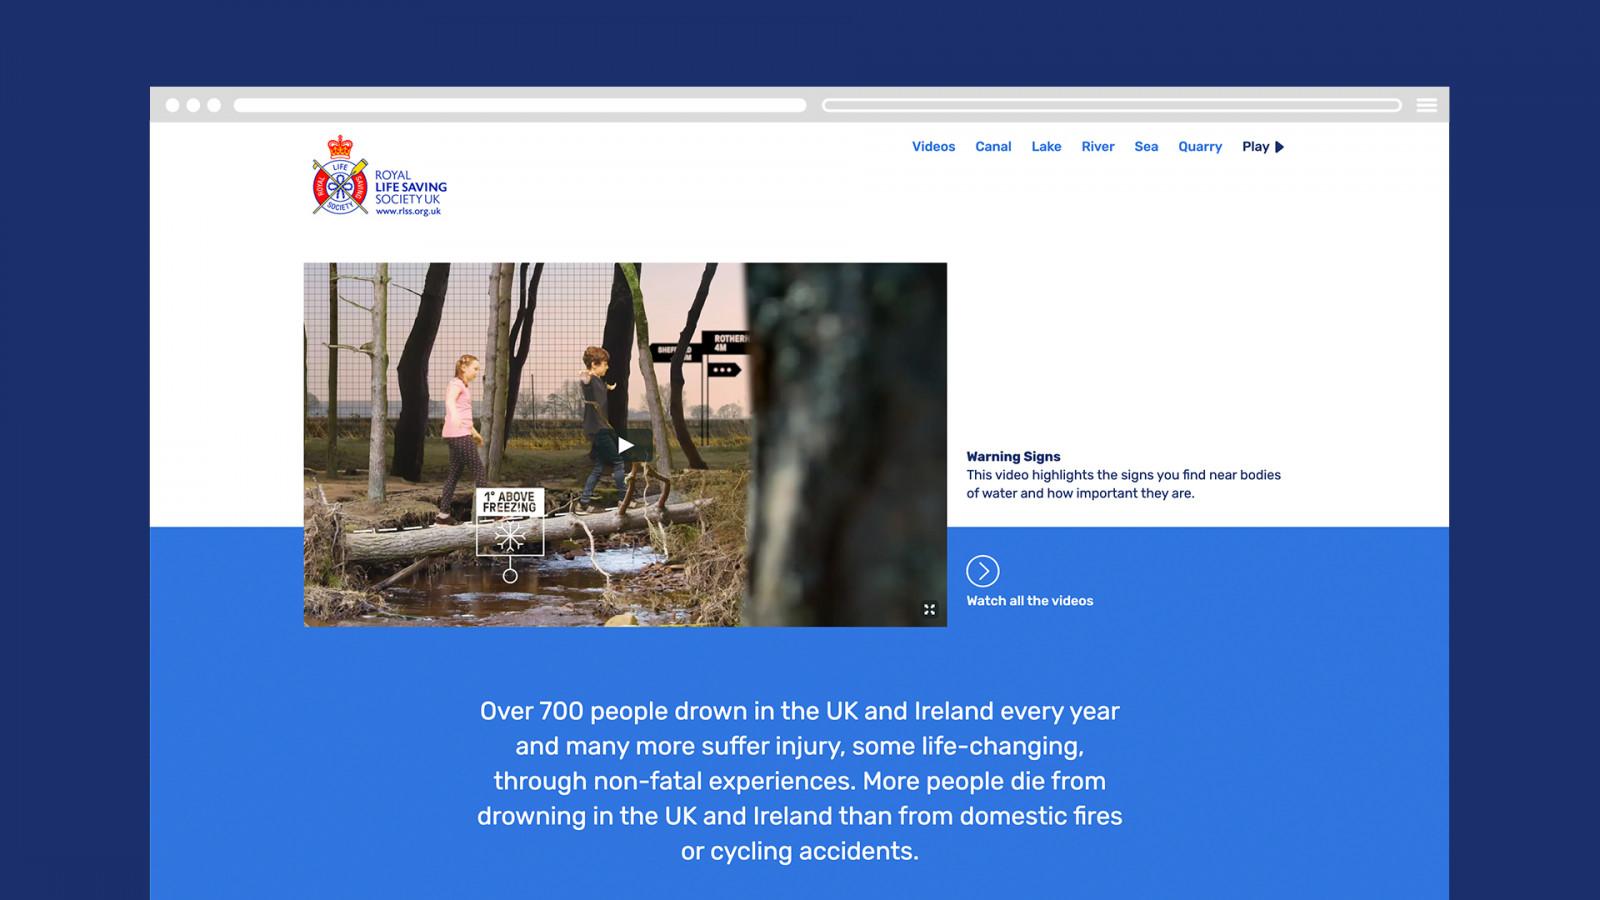 Royal Life Saving Society –website -  image for Royal Life Saving Society project